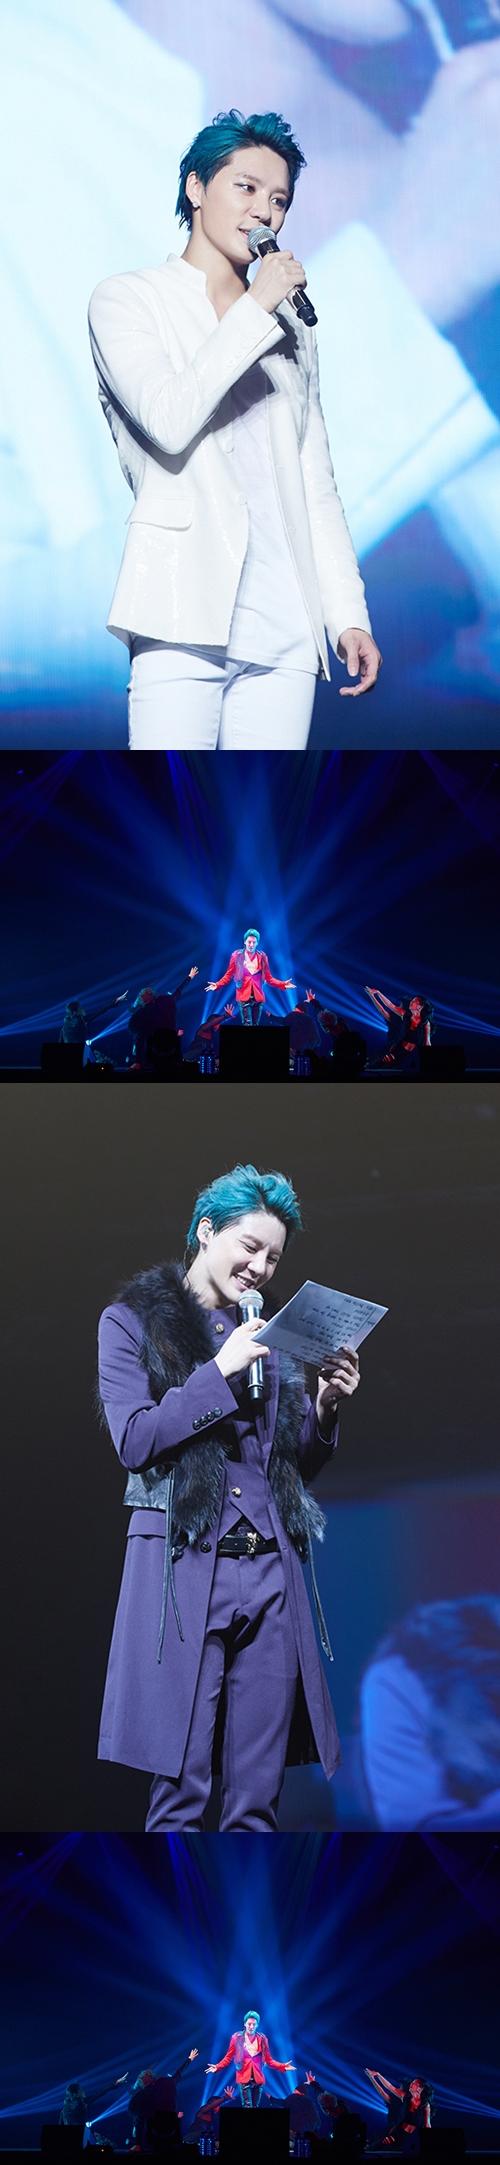 20150305_JYJ's_ Junsu_ Successfully_ Kicks_ Off_ First_ Concert_ in_ Osaka_1